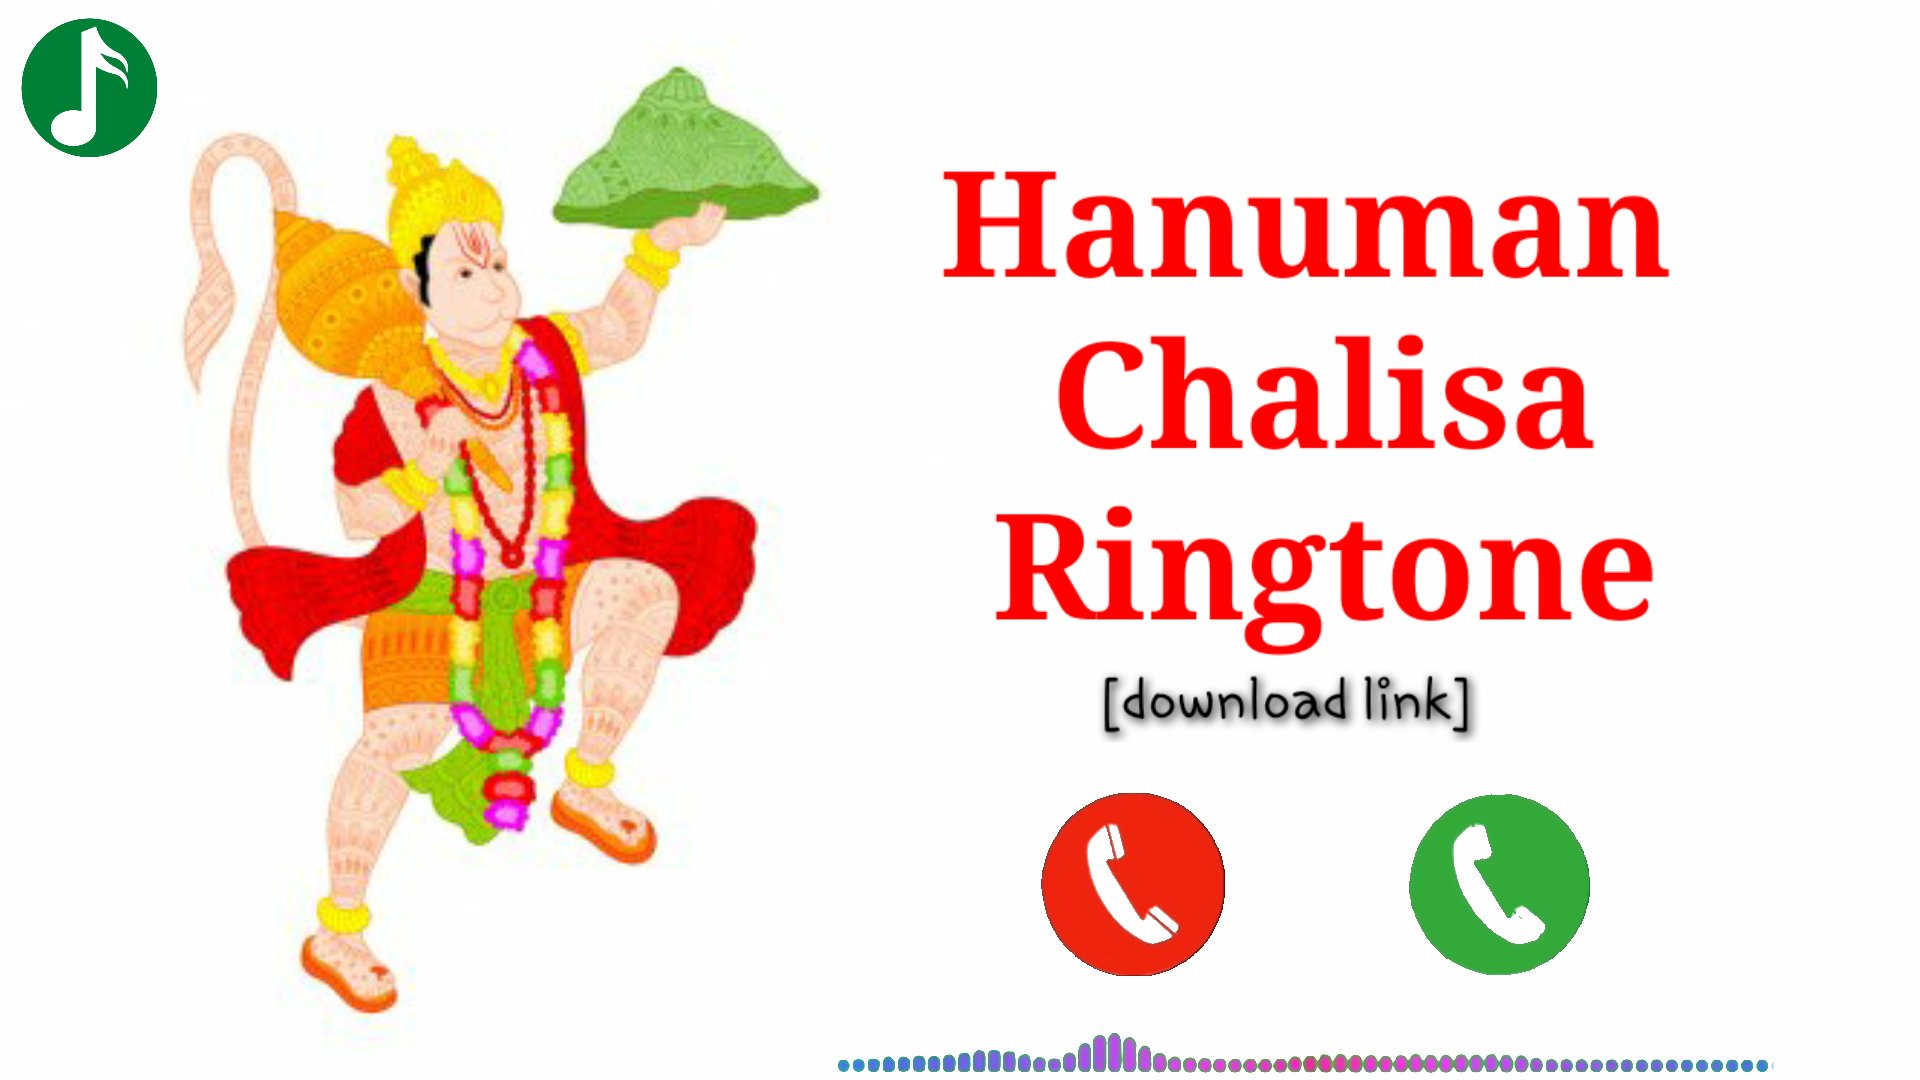 Hanuman Chalisa Ringtone